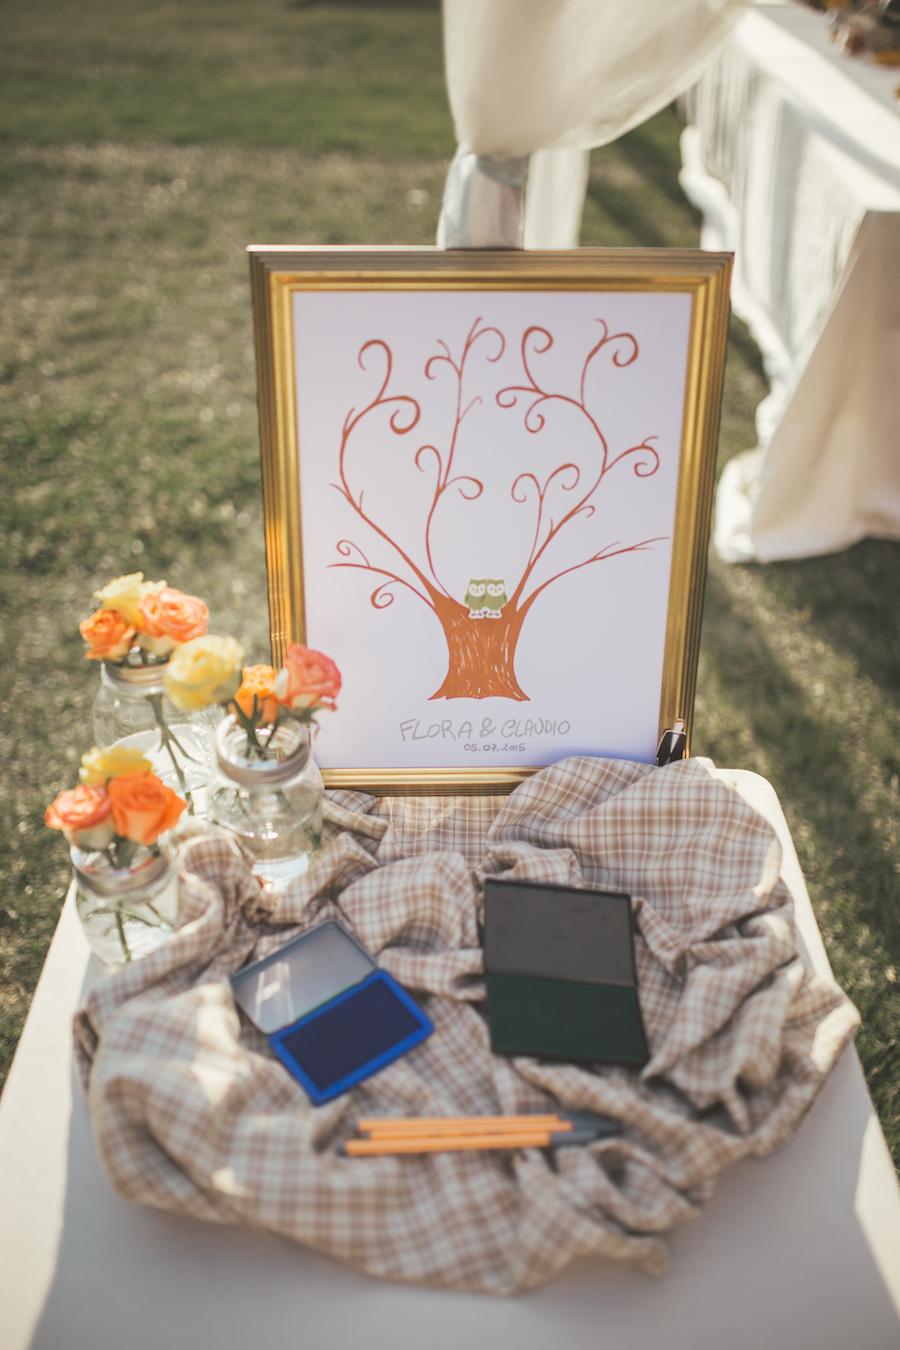 Matrimonio Country Chic Emilia Romagna : Un matrimonio eco friendly e boho chic wedding wonderland